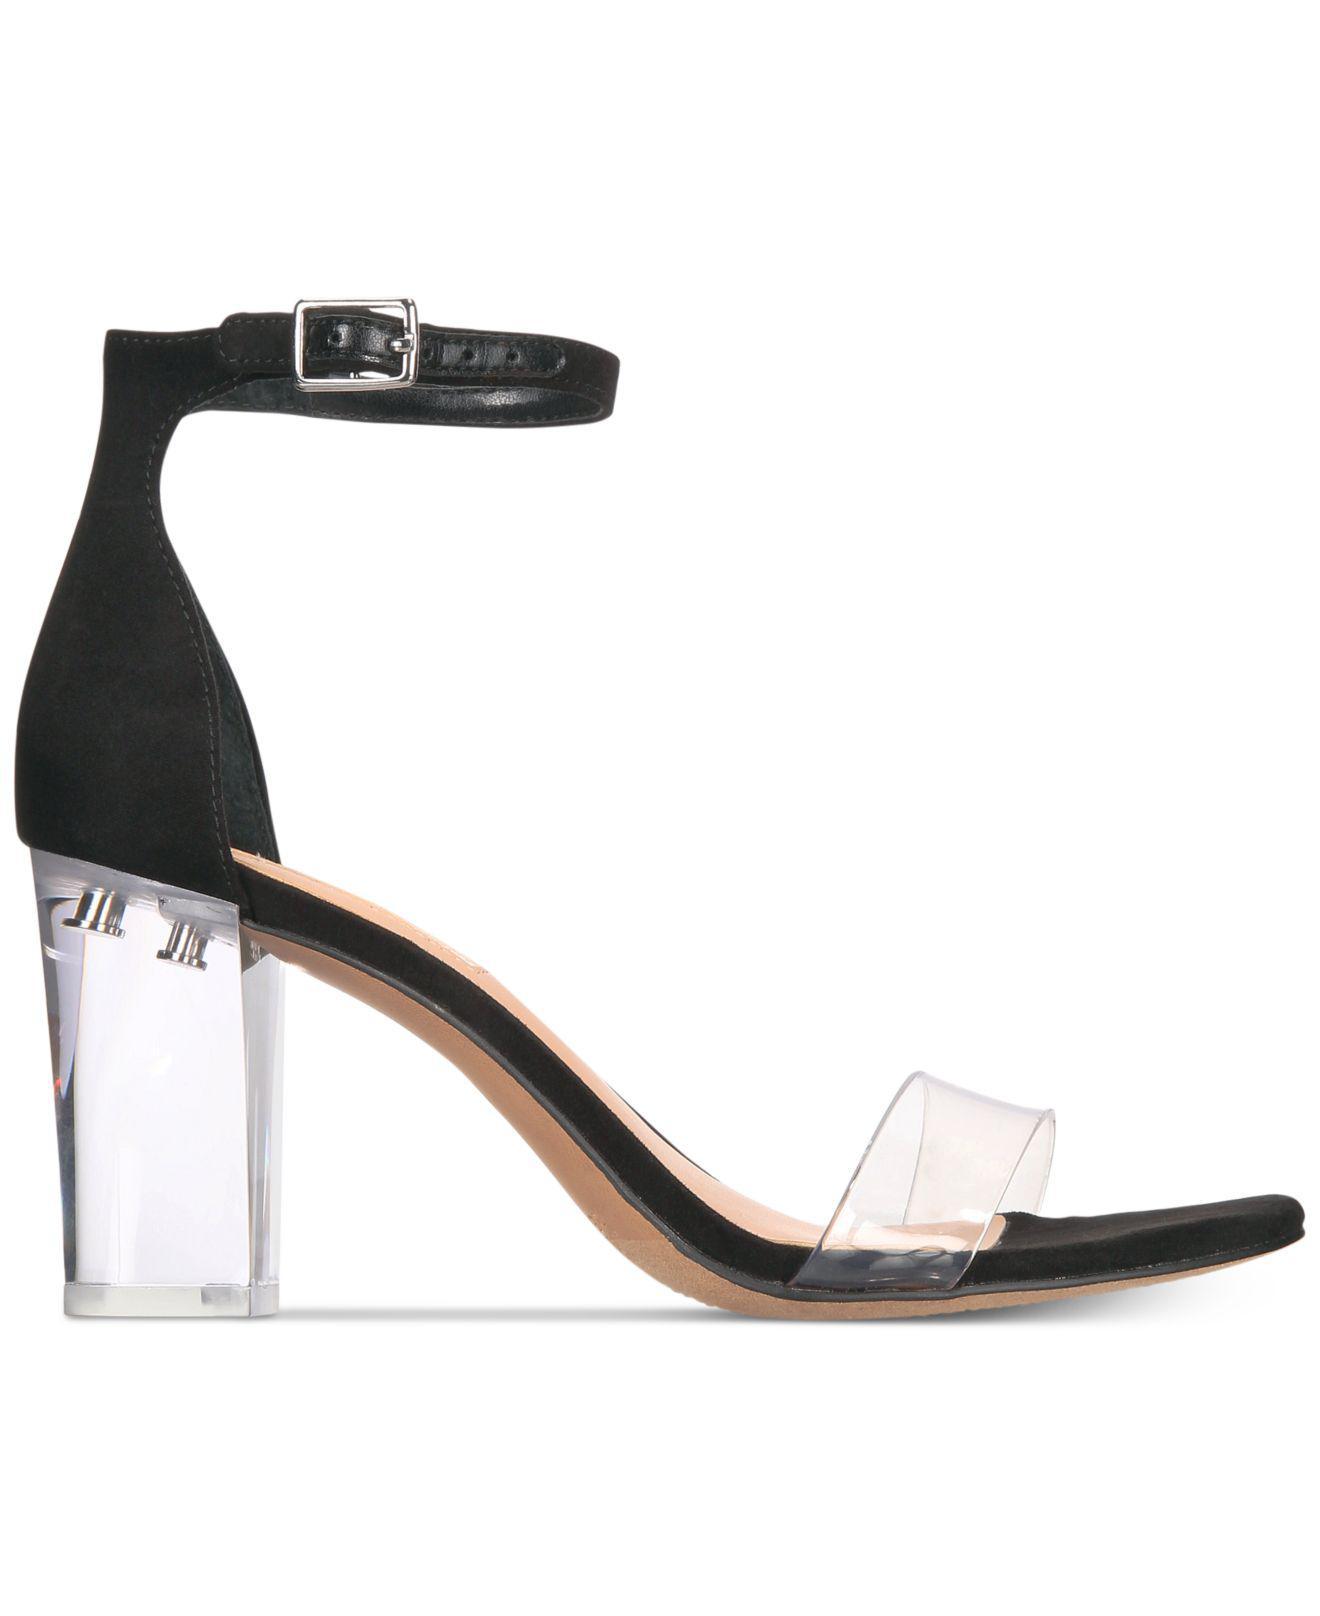 d98c6420774 Lyst - INC International Concepts Kivah Block Heel Dress Sandals in ...